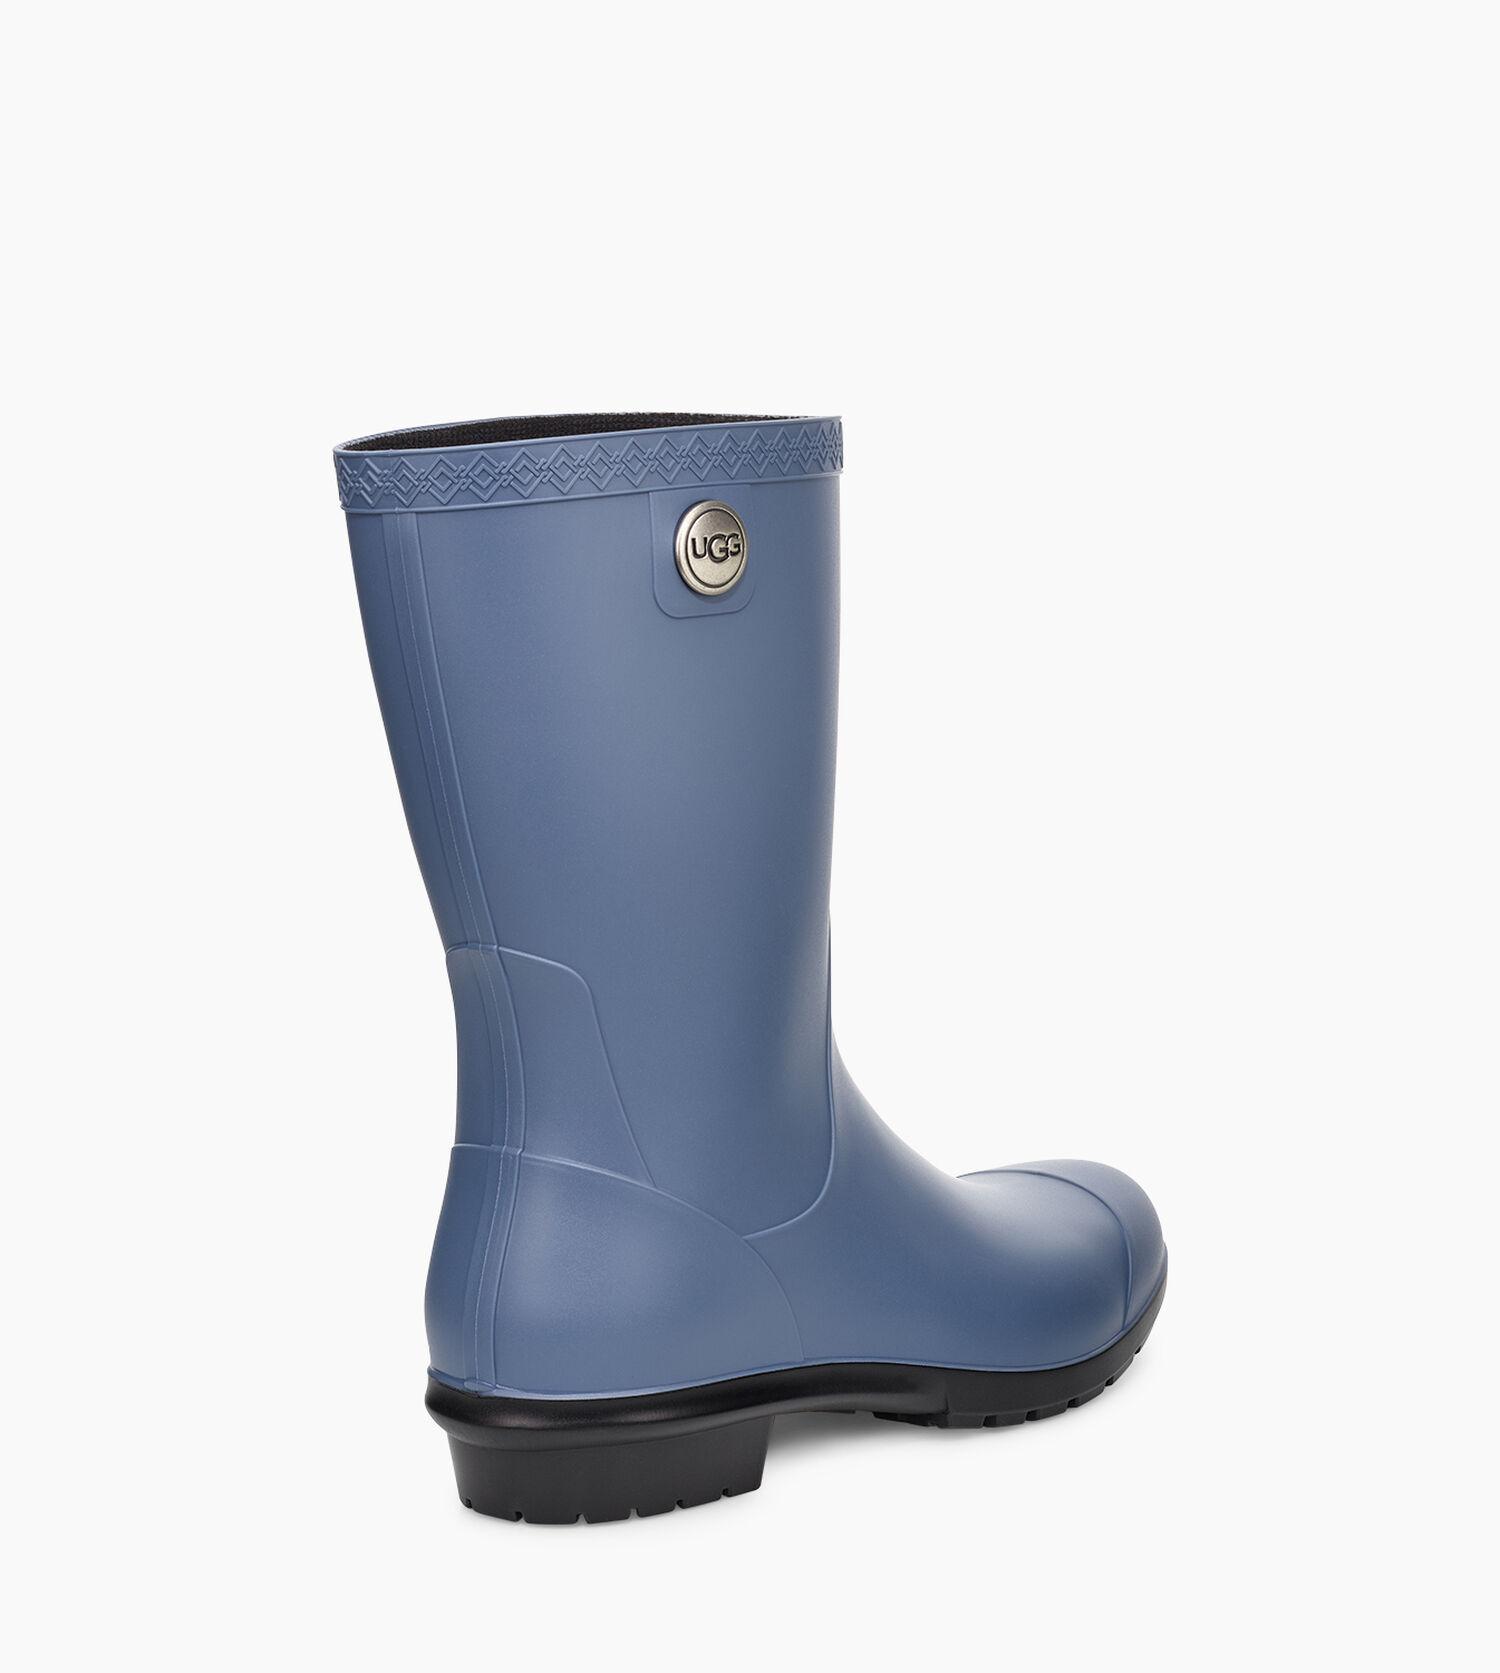 ff6f61ec581 Women's Share this product Sienna Matte Rain Boot